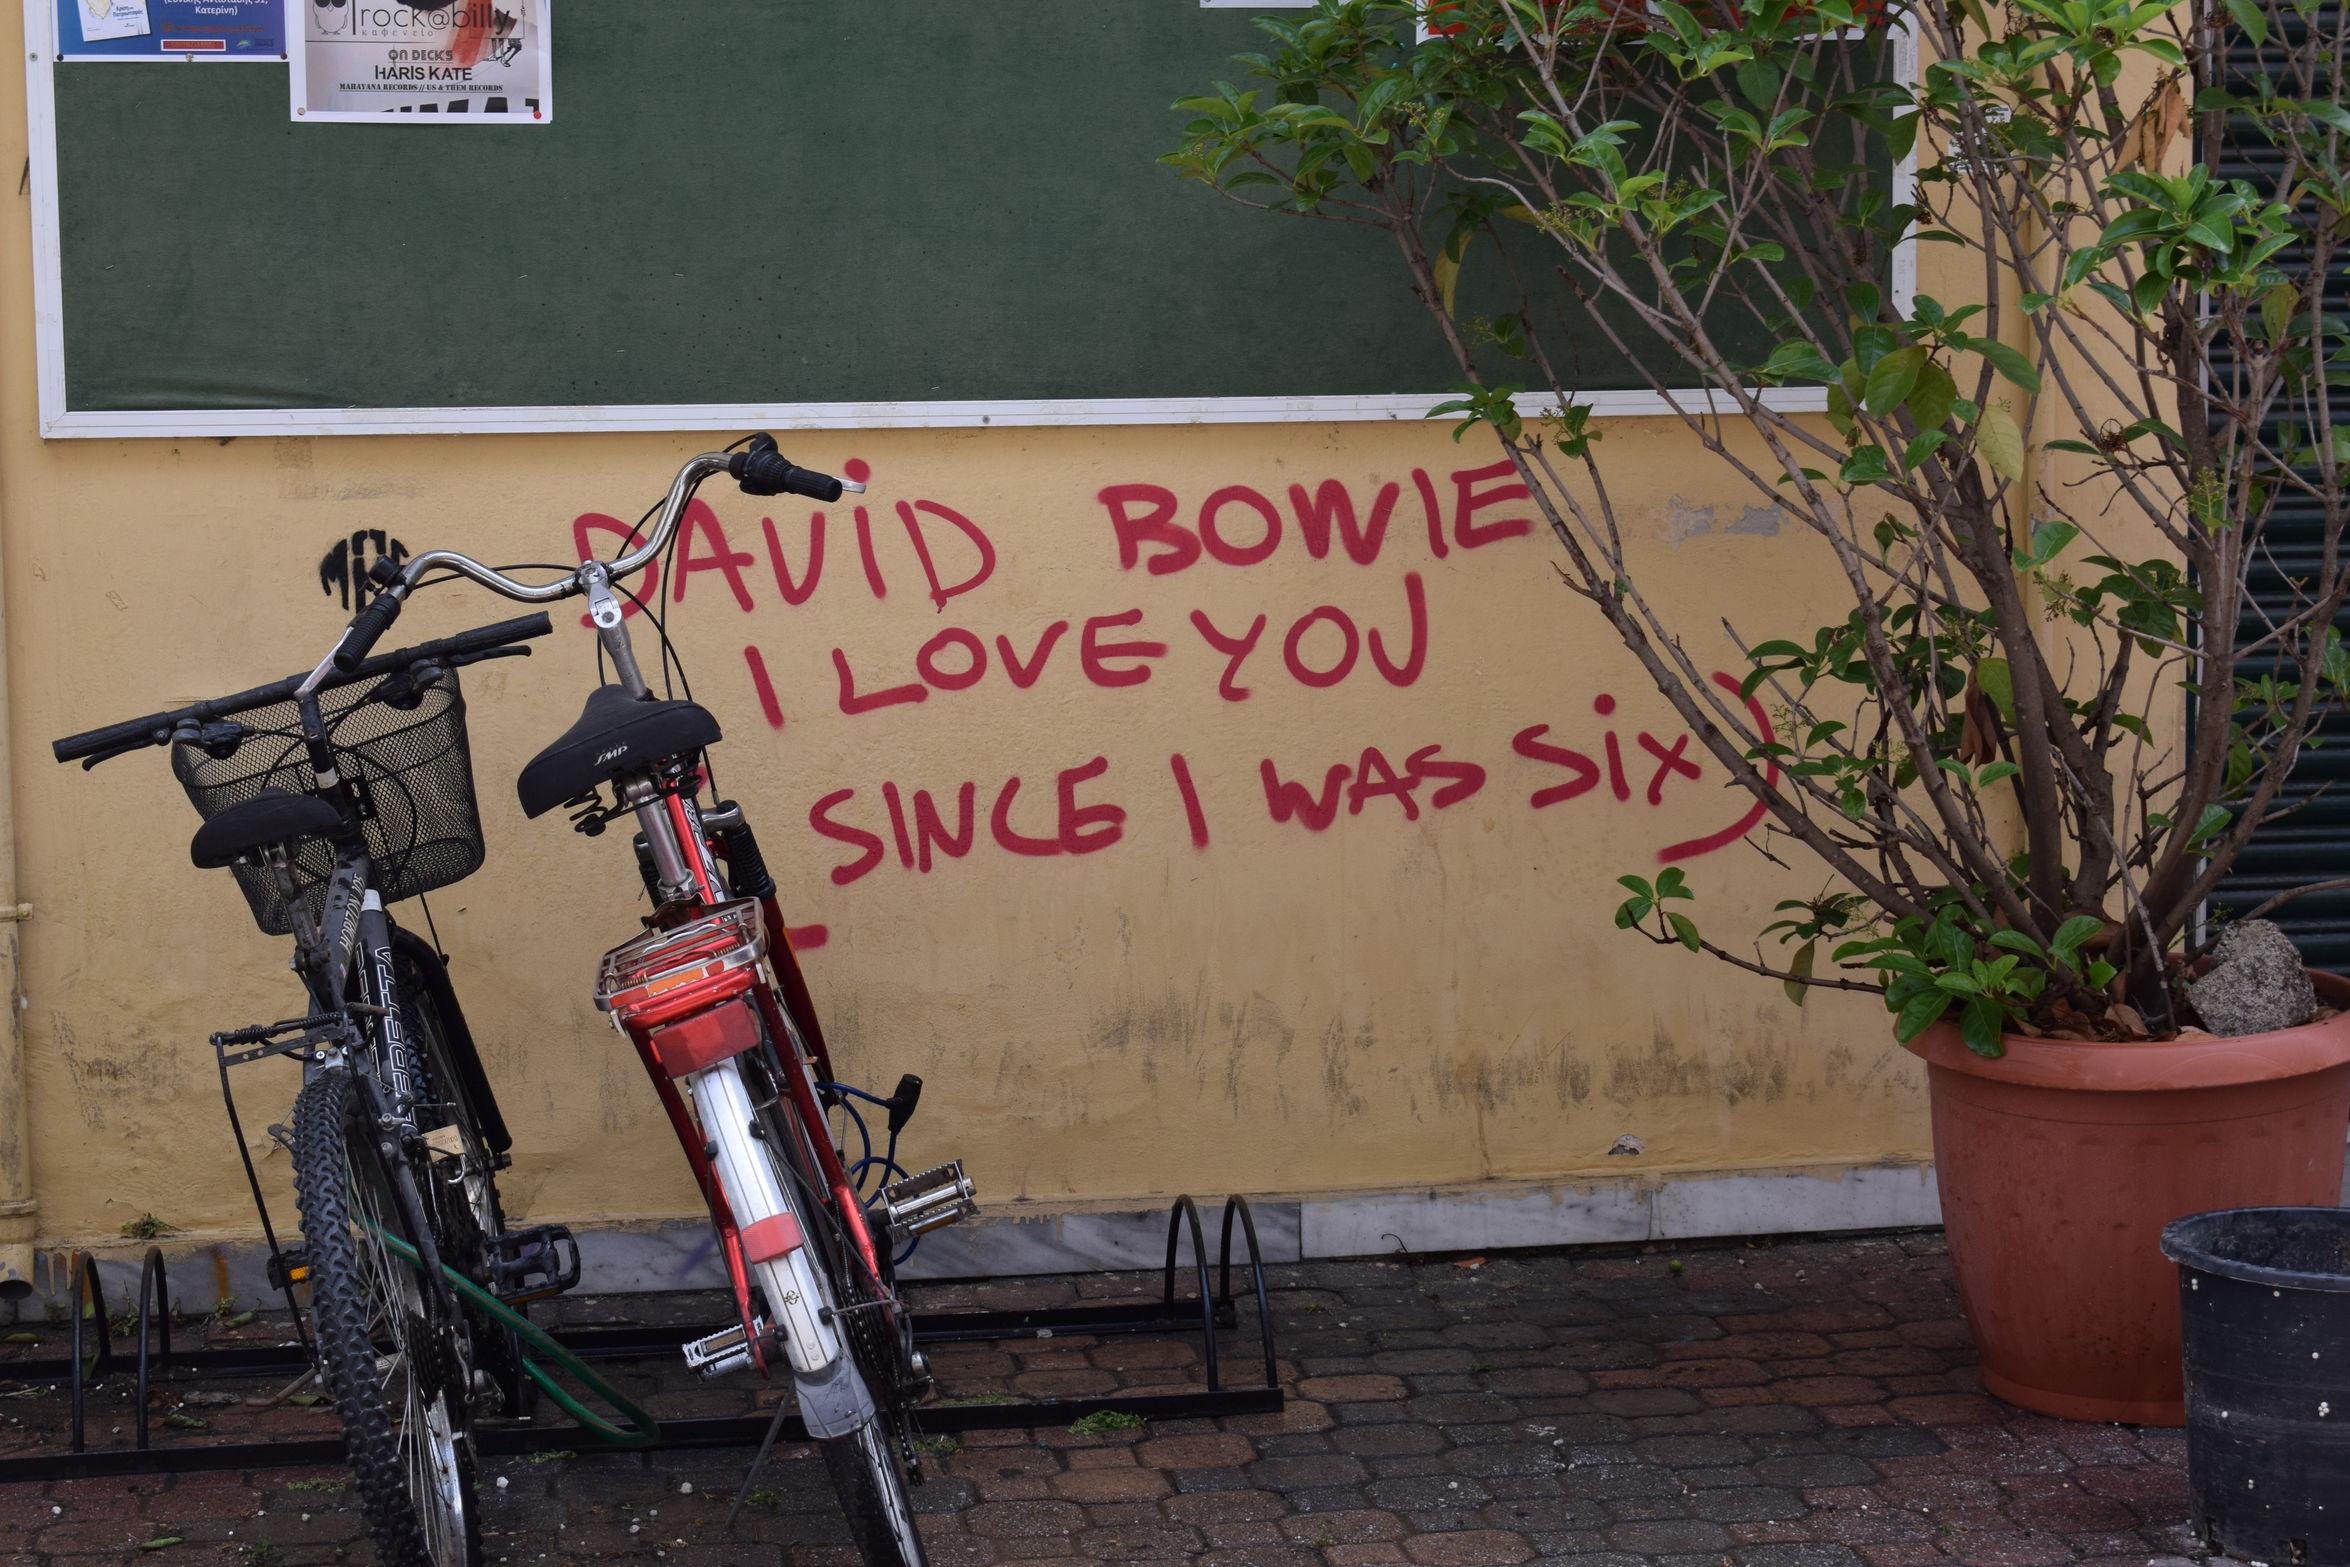 #art #bicycle #bikes #DavidBowie #graffiti  #idol #inspiration  #love #Plant Day No People Outdoors